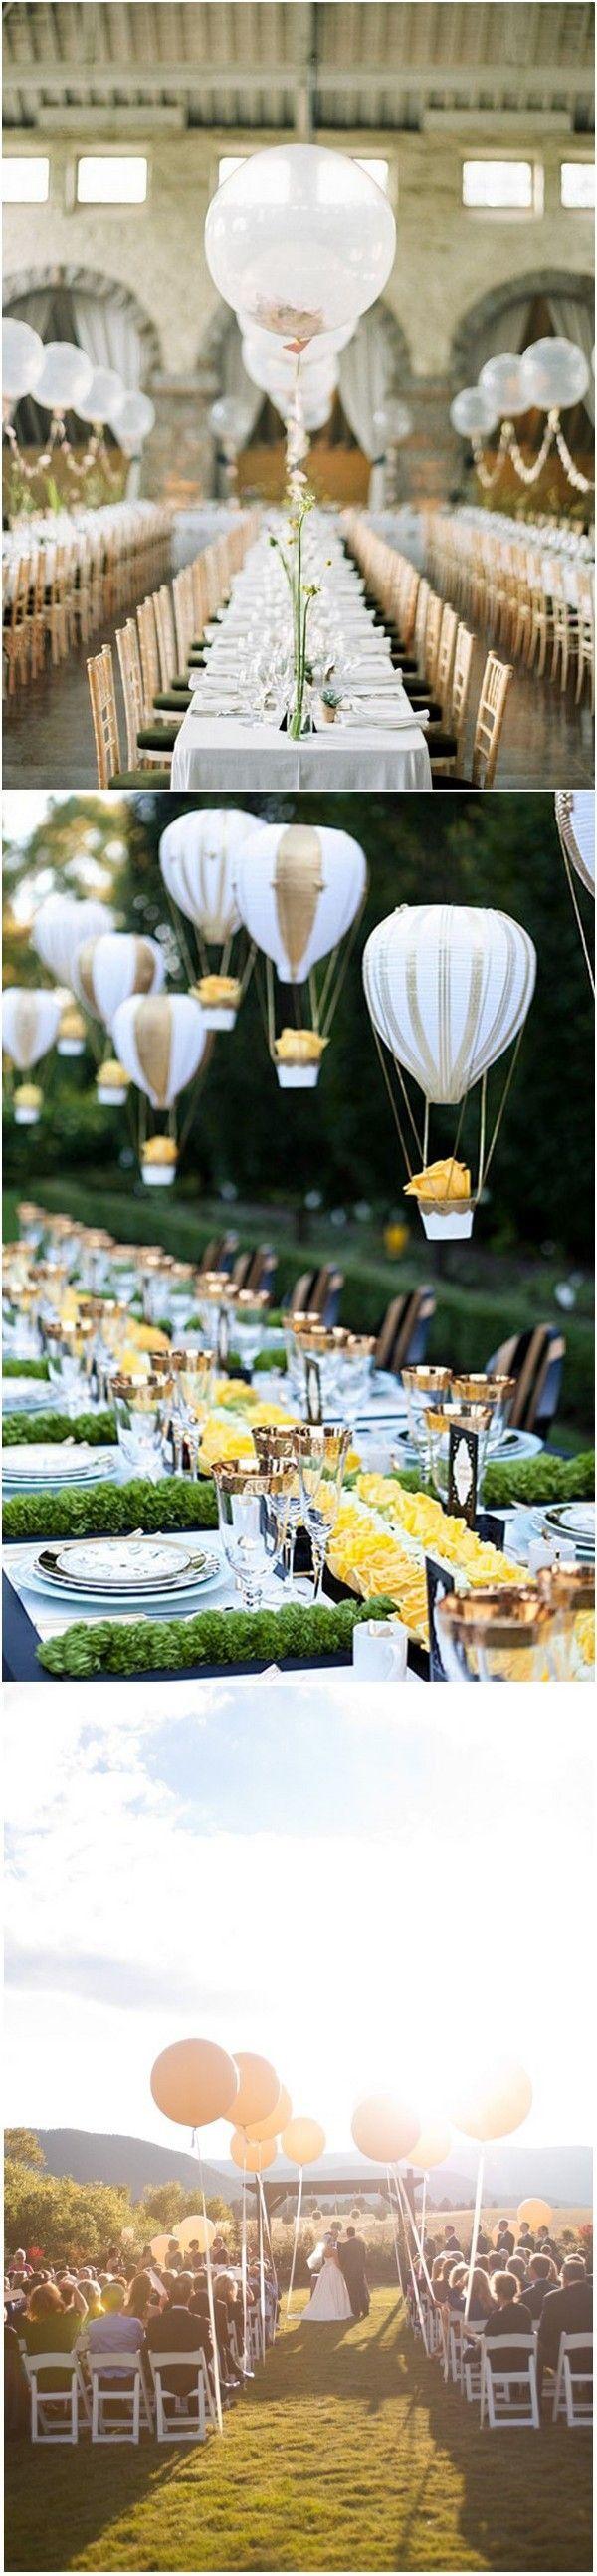 wedding decoration ideas with balloons #weddingdecoration